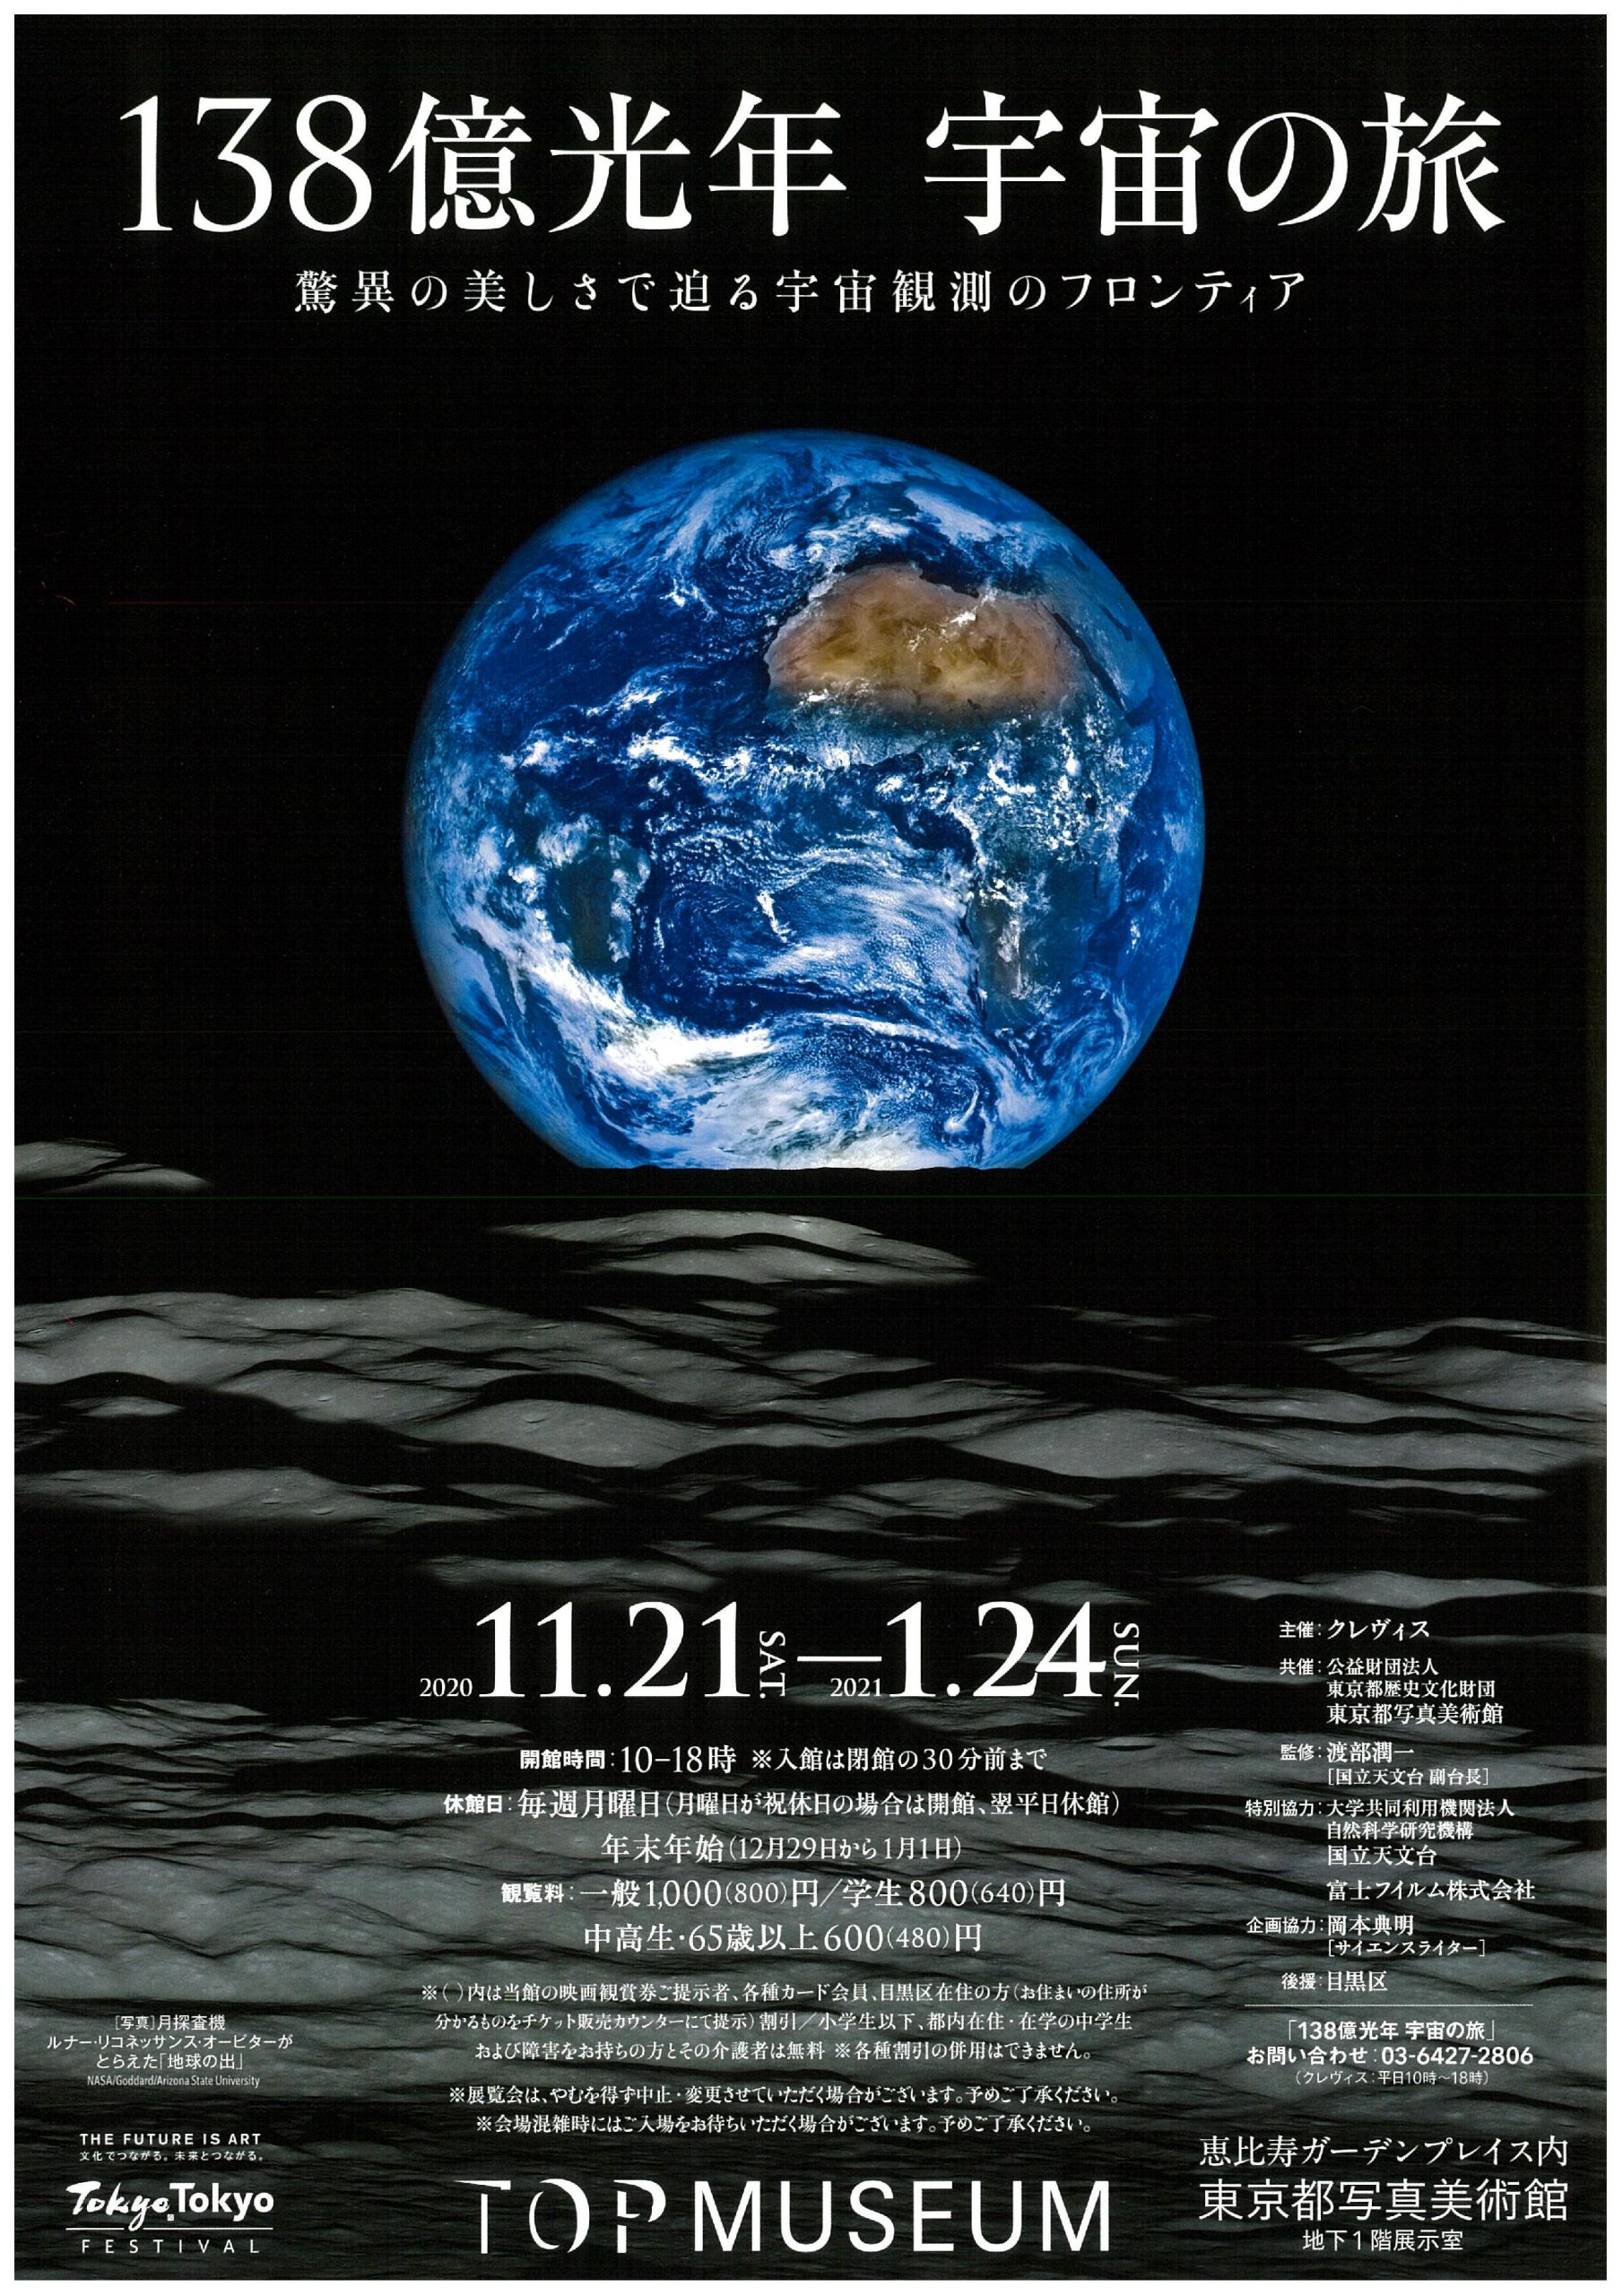 Space Odyssey TOP tokyo photographic art museum metropolis magazine japan